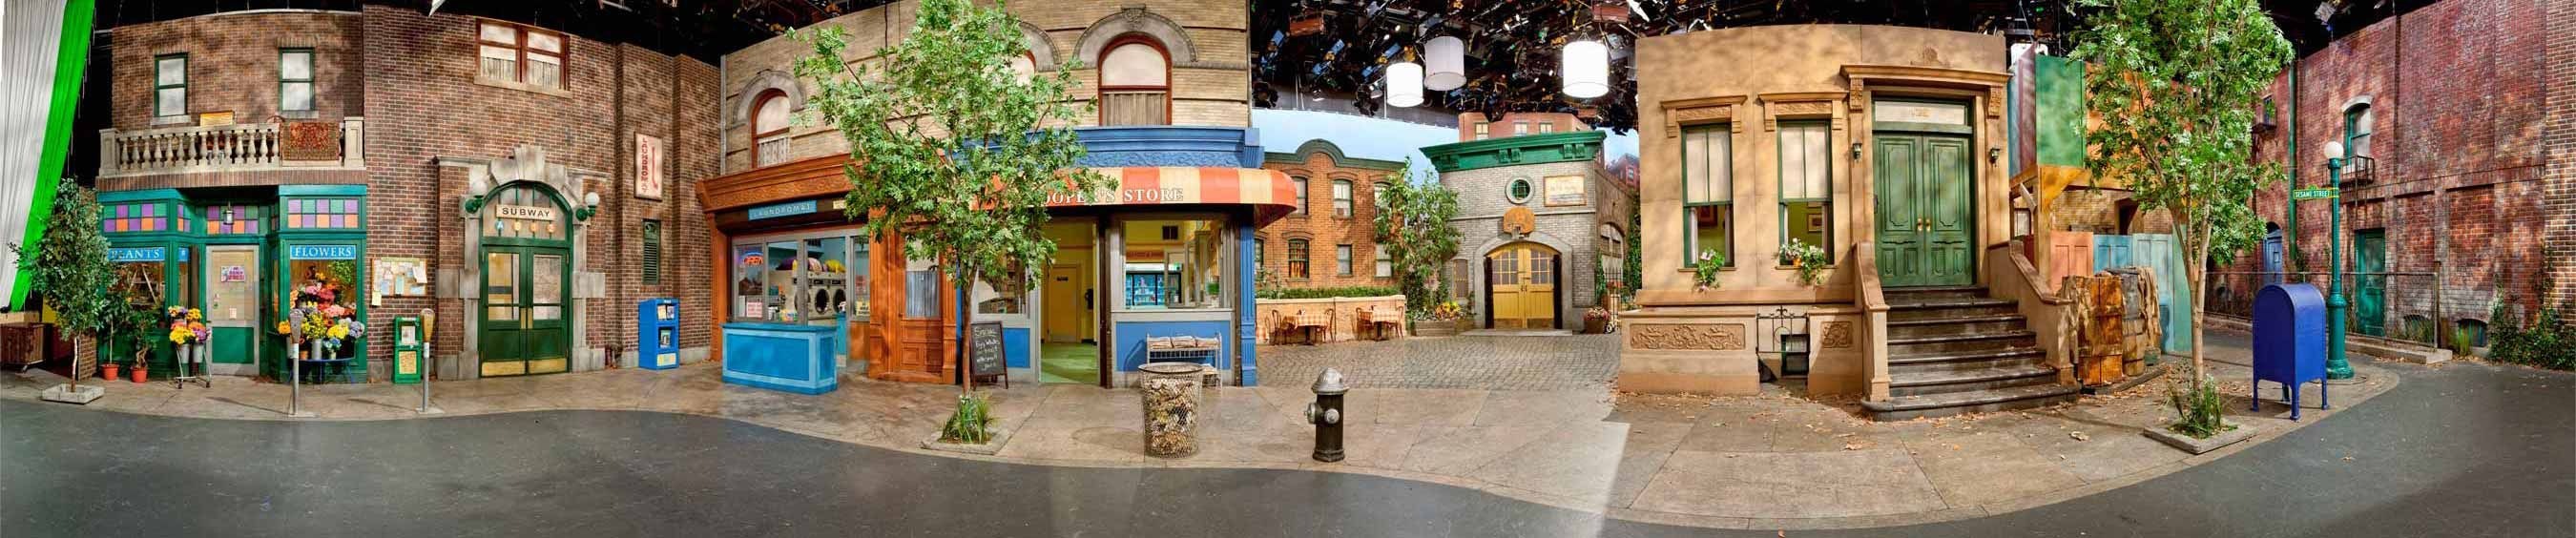 Sesame Street Location In 2019 Muppets Sesame Street